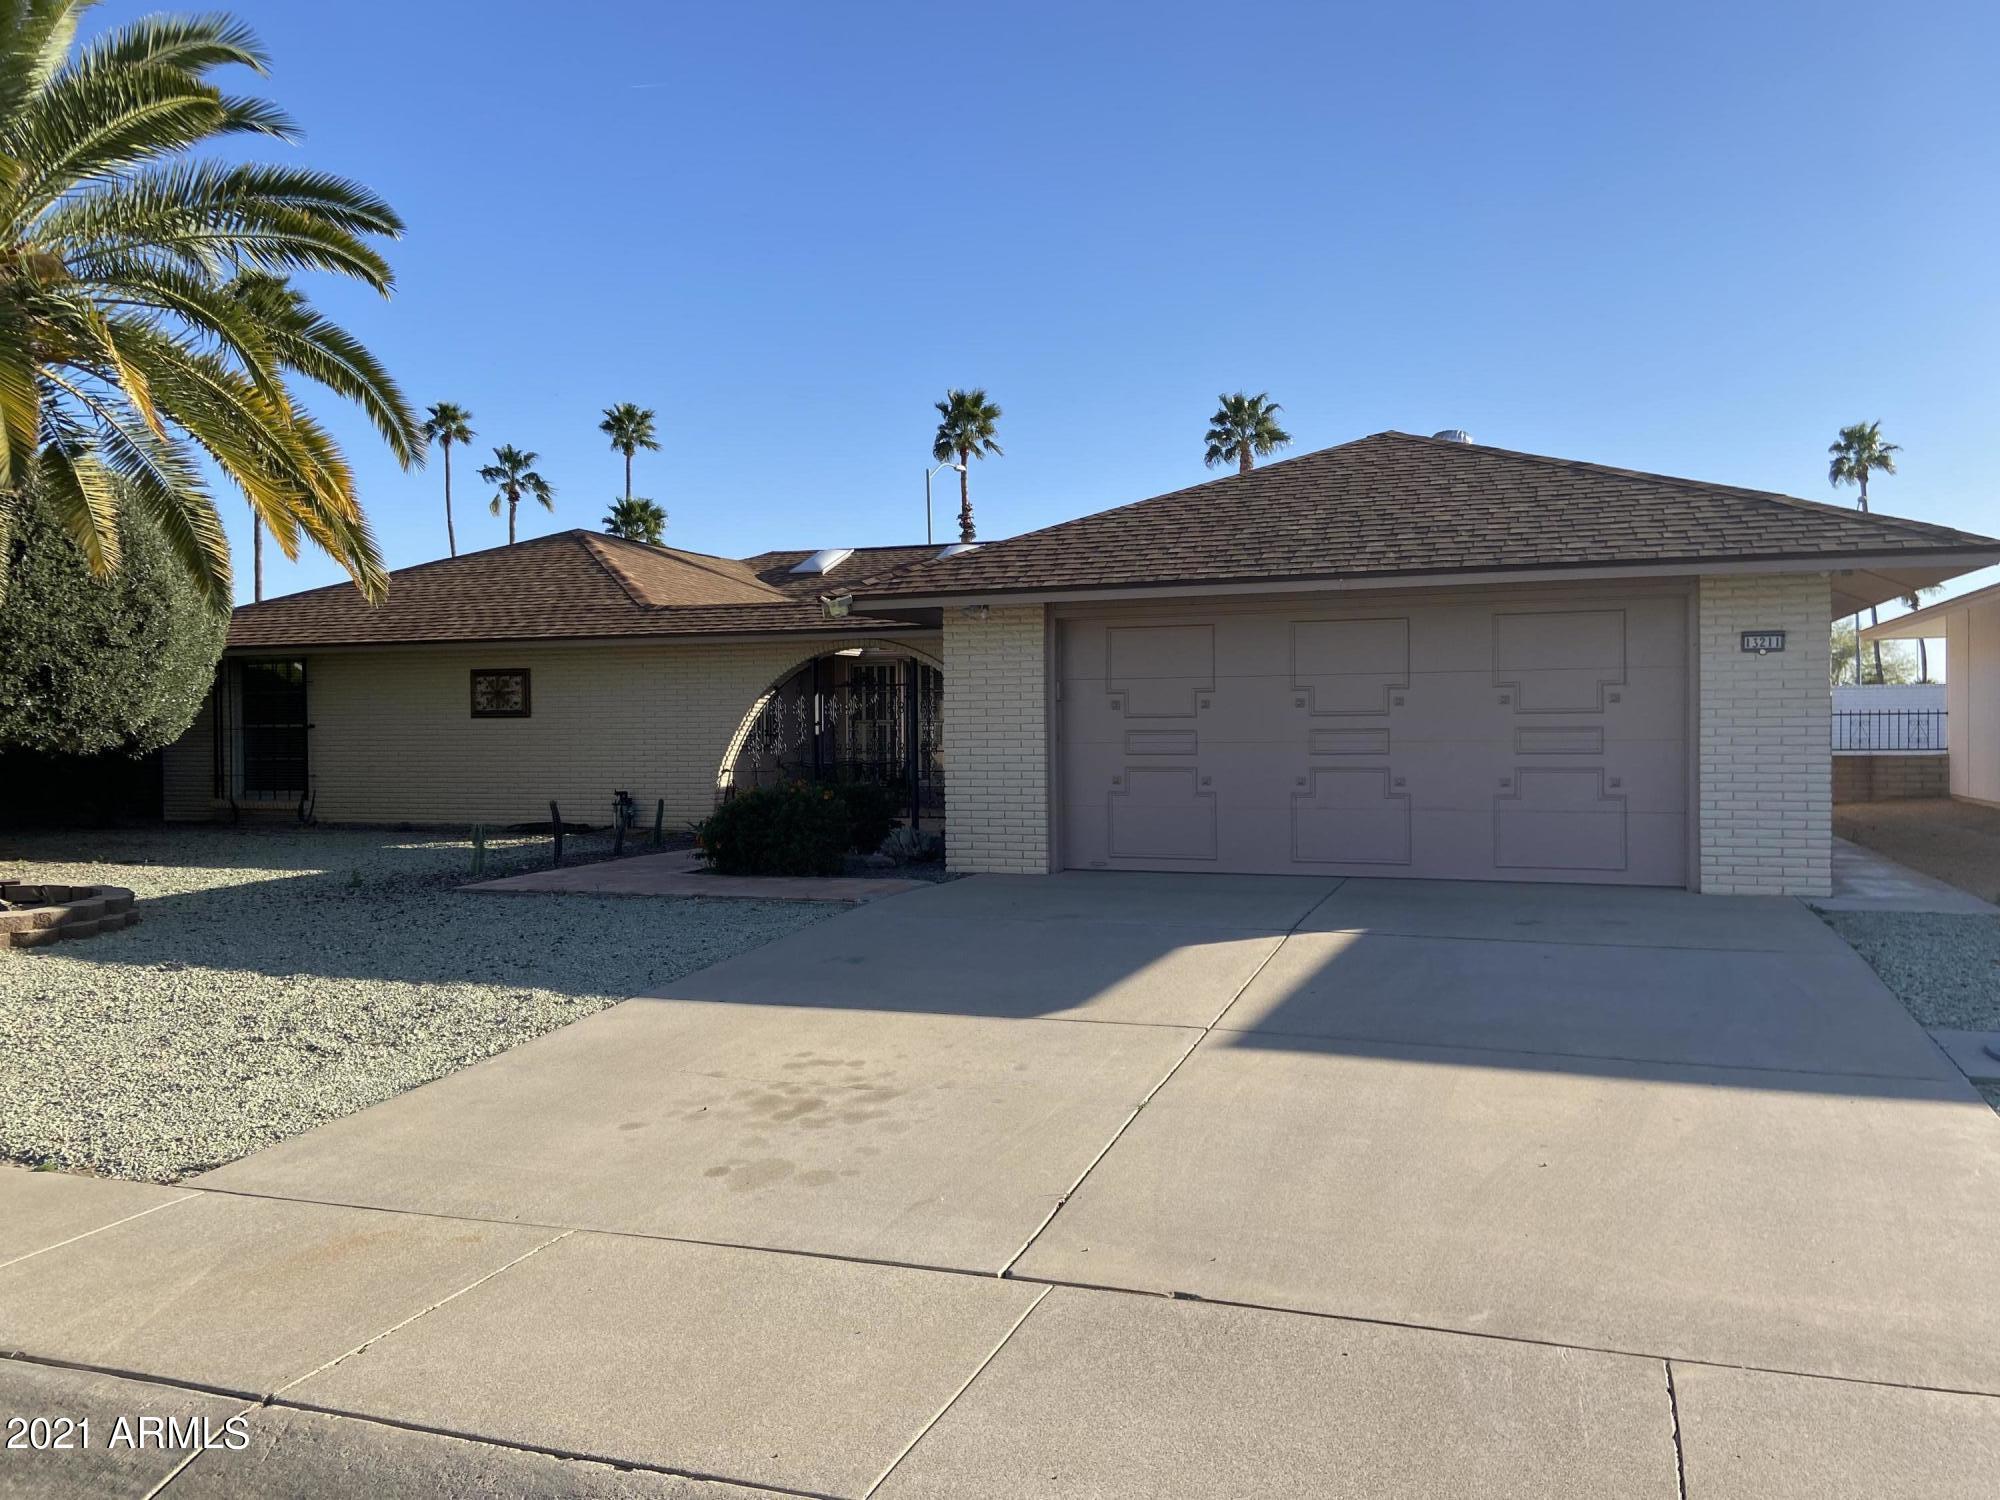 13211 W DESERT GLEN Drive, Sun City West, AZ 85375, 3 Bedrooms Bedrooms, ,Residential,For Sale,13211 W DESERT GLEN Drive,6203869